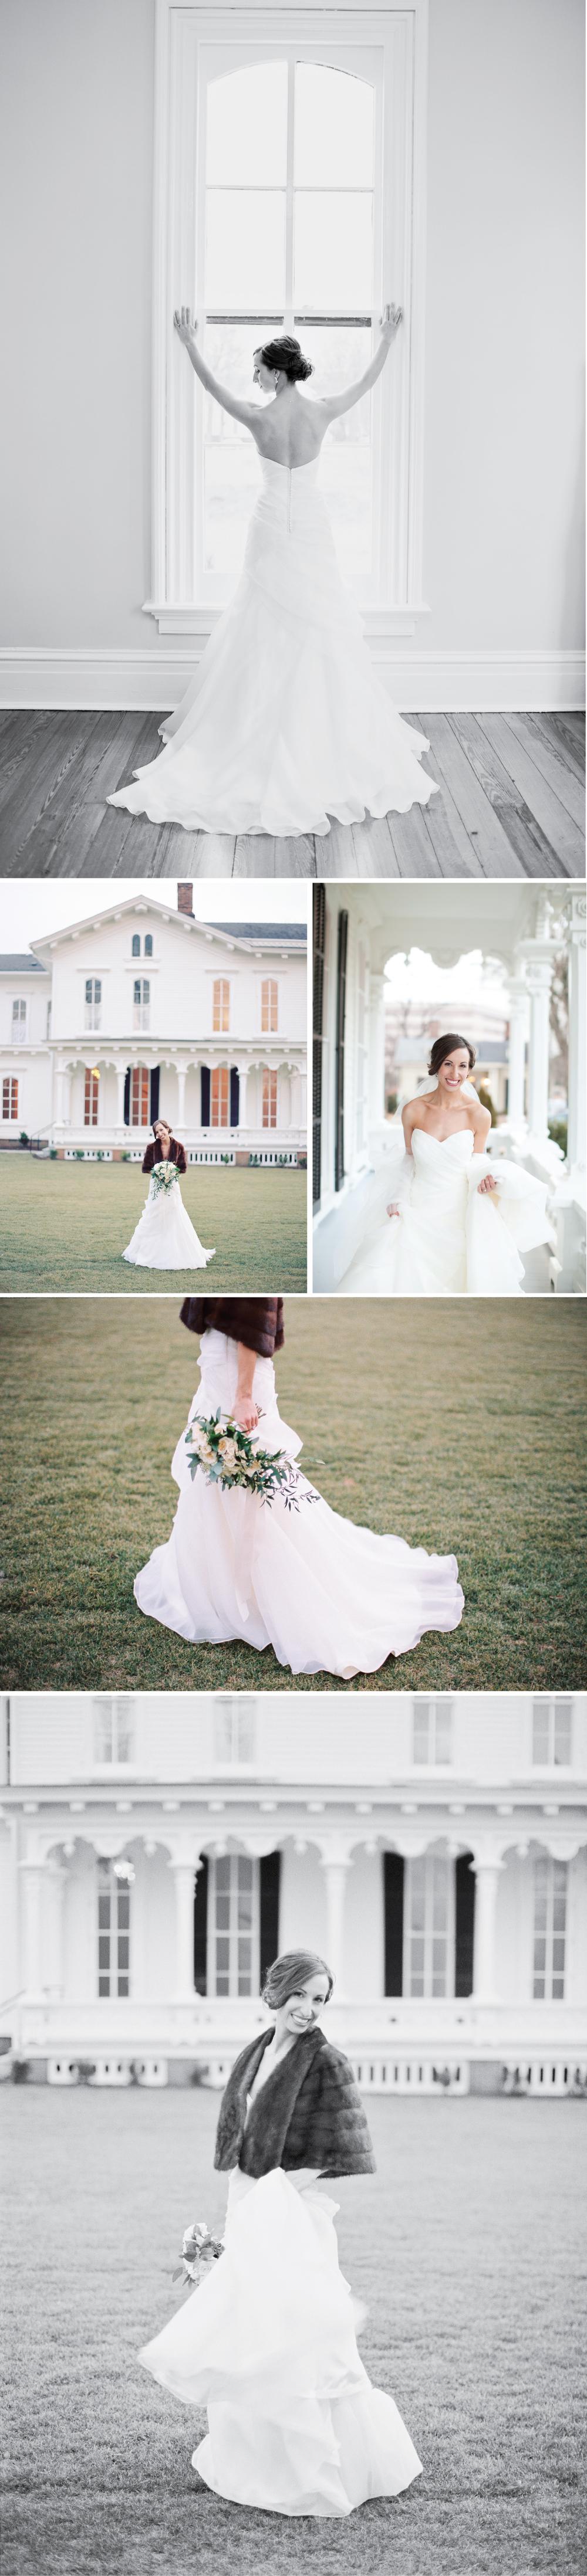 bridal-portraits-blog-post3.jpg